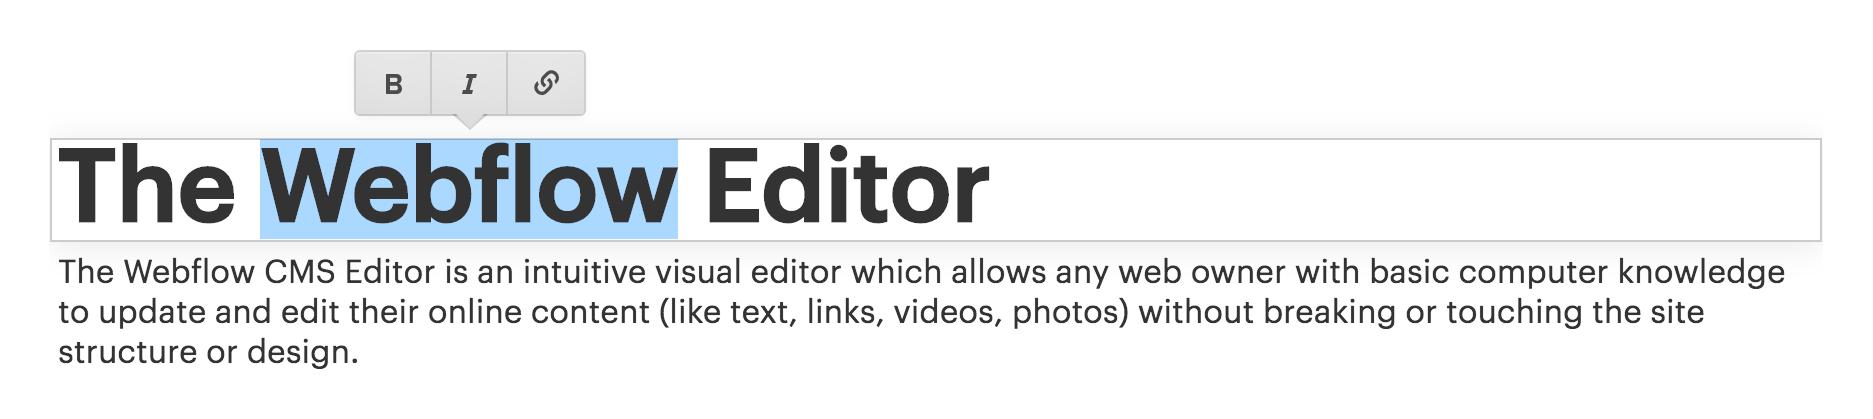 Intro To The Editor Webflow University